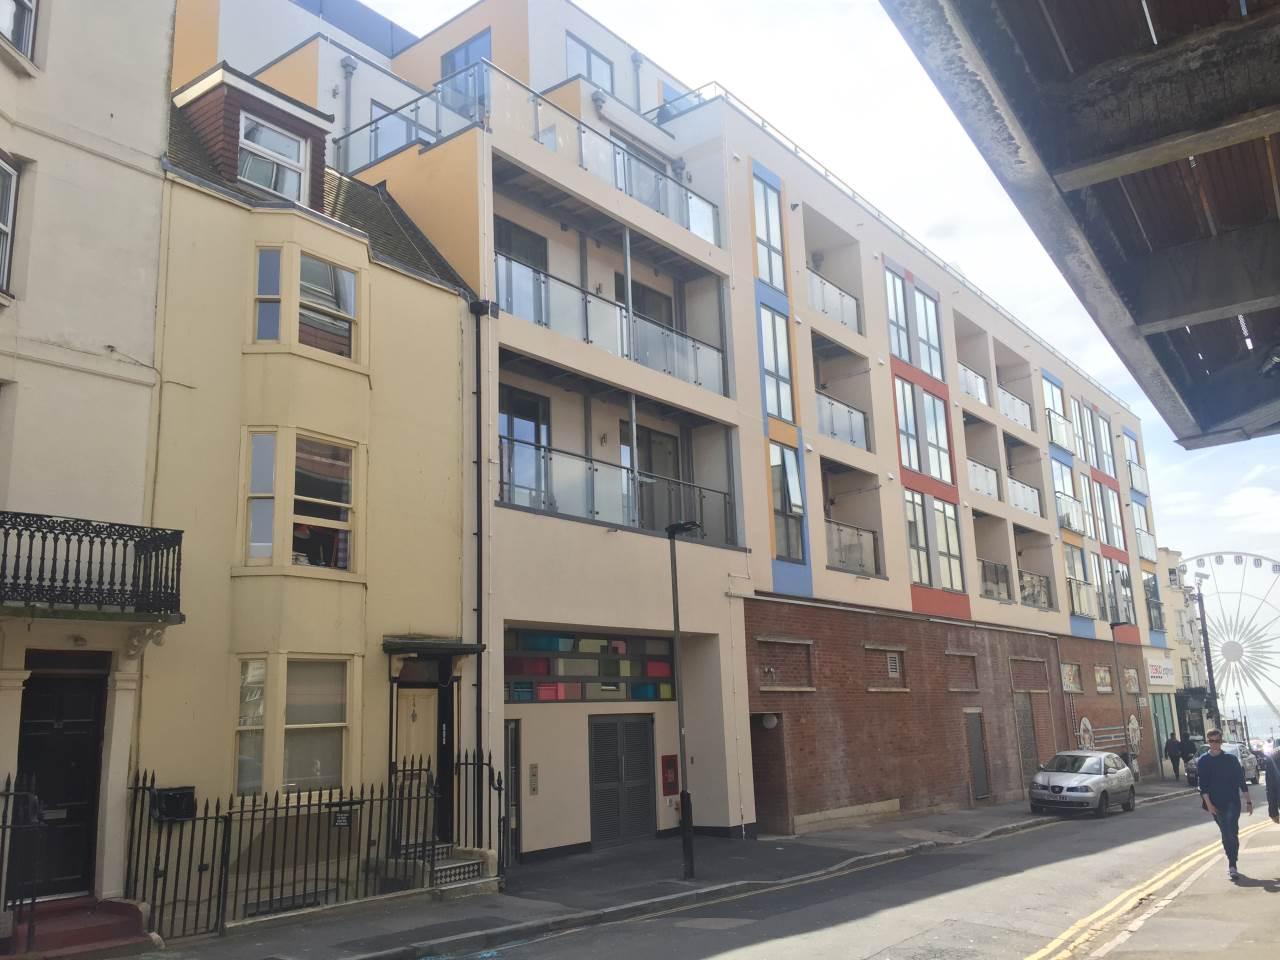 2 bed flat to rent in Dorset Gardens, Brighton 0